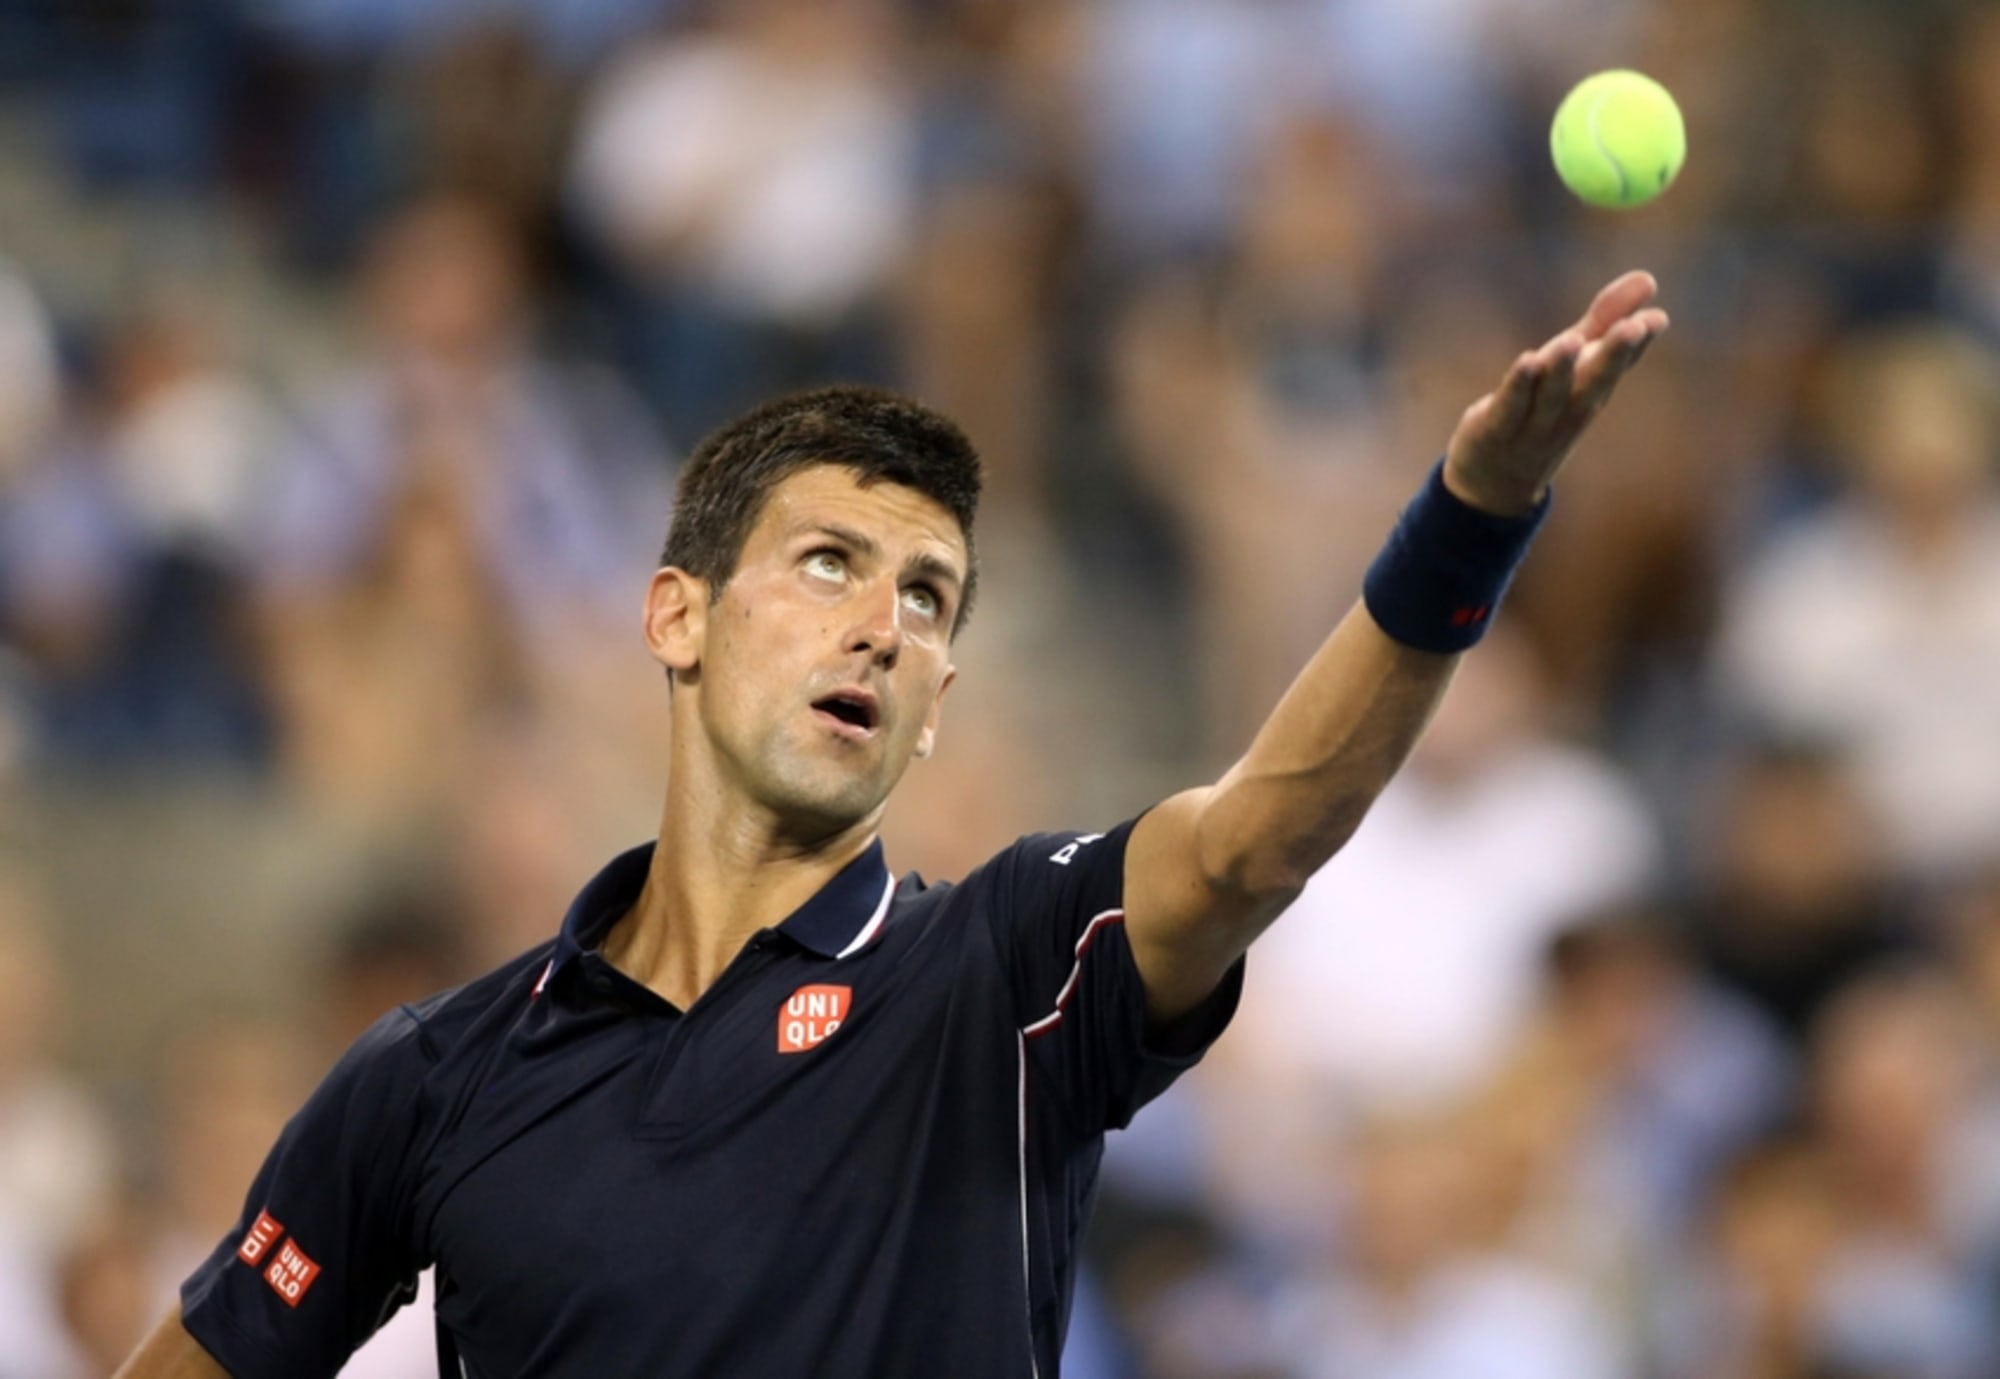 Novak Djokovic Defeats Andy Murray For Fifth Career Australian Open Title